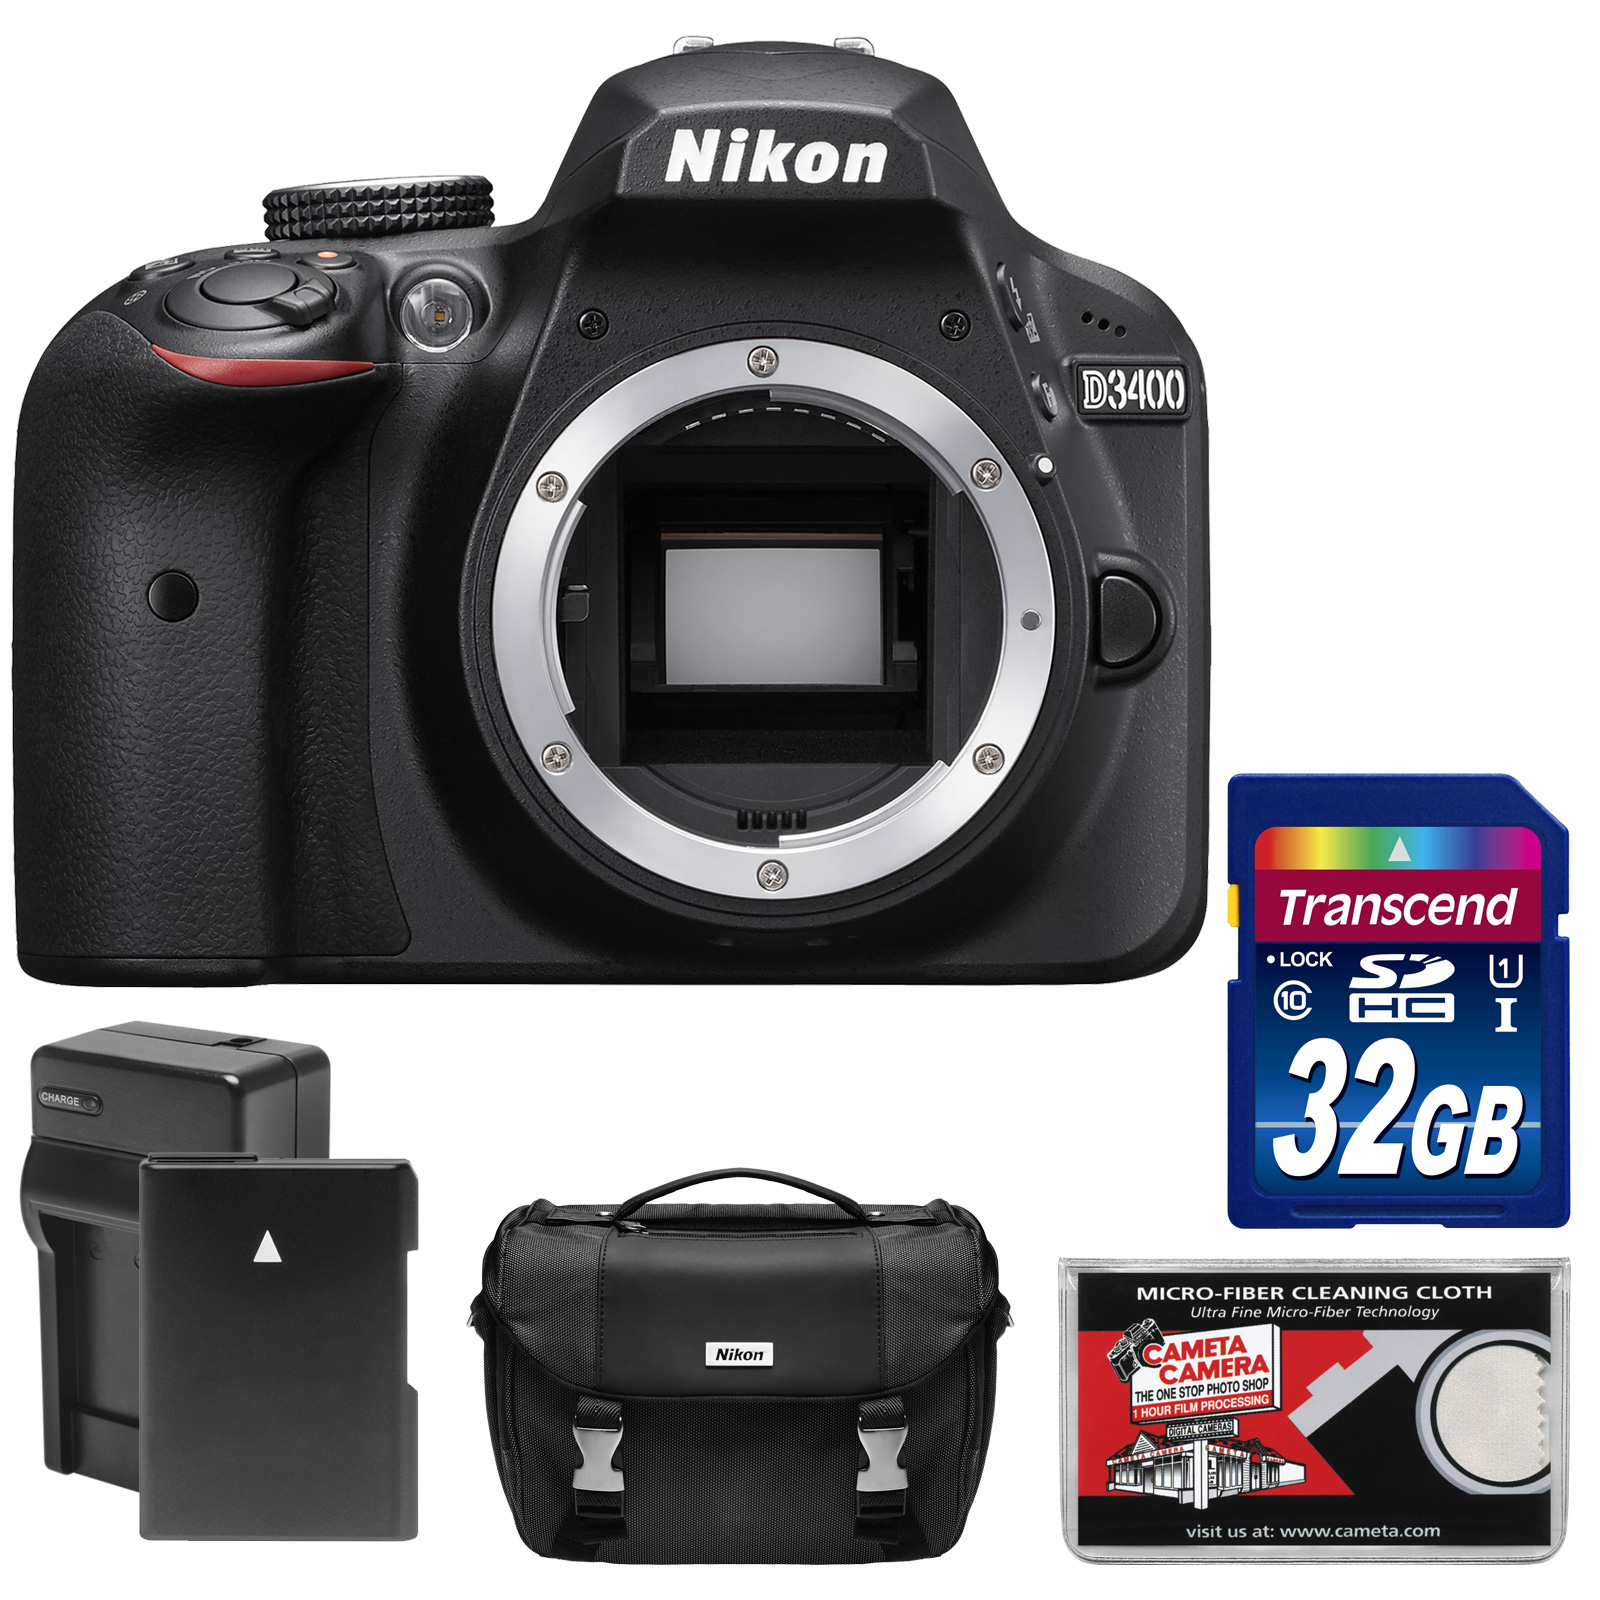 Nikon D3400 Digital SLR Camera Body (Black) - Refurbished with 32GB Card + Battery & Charger + Case + Kit